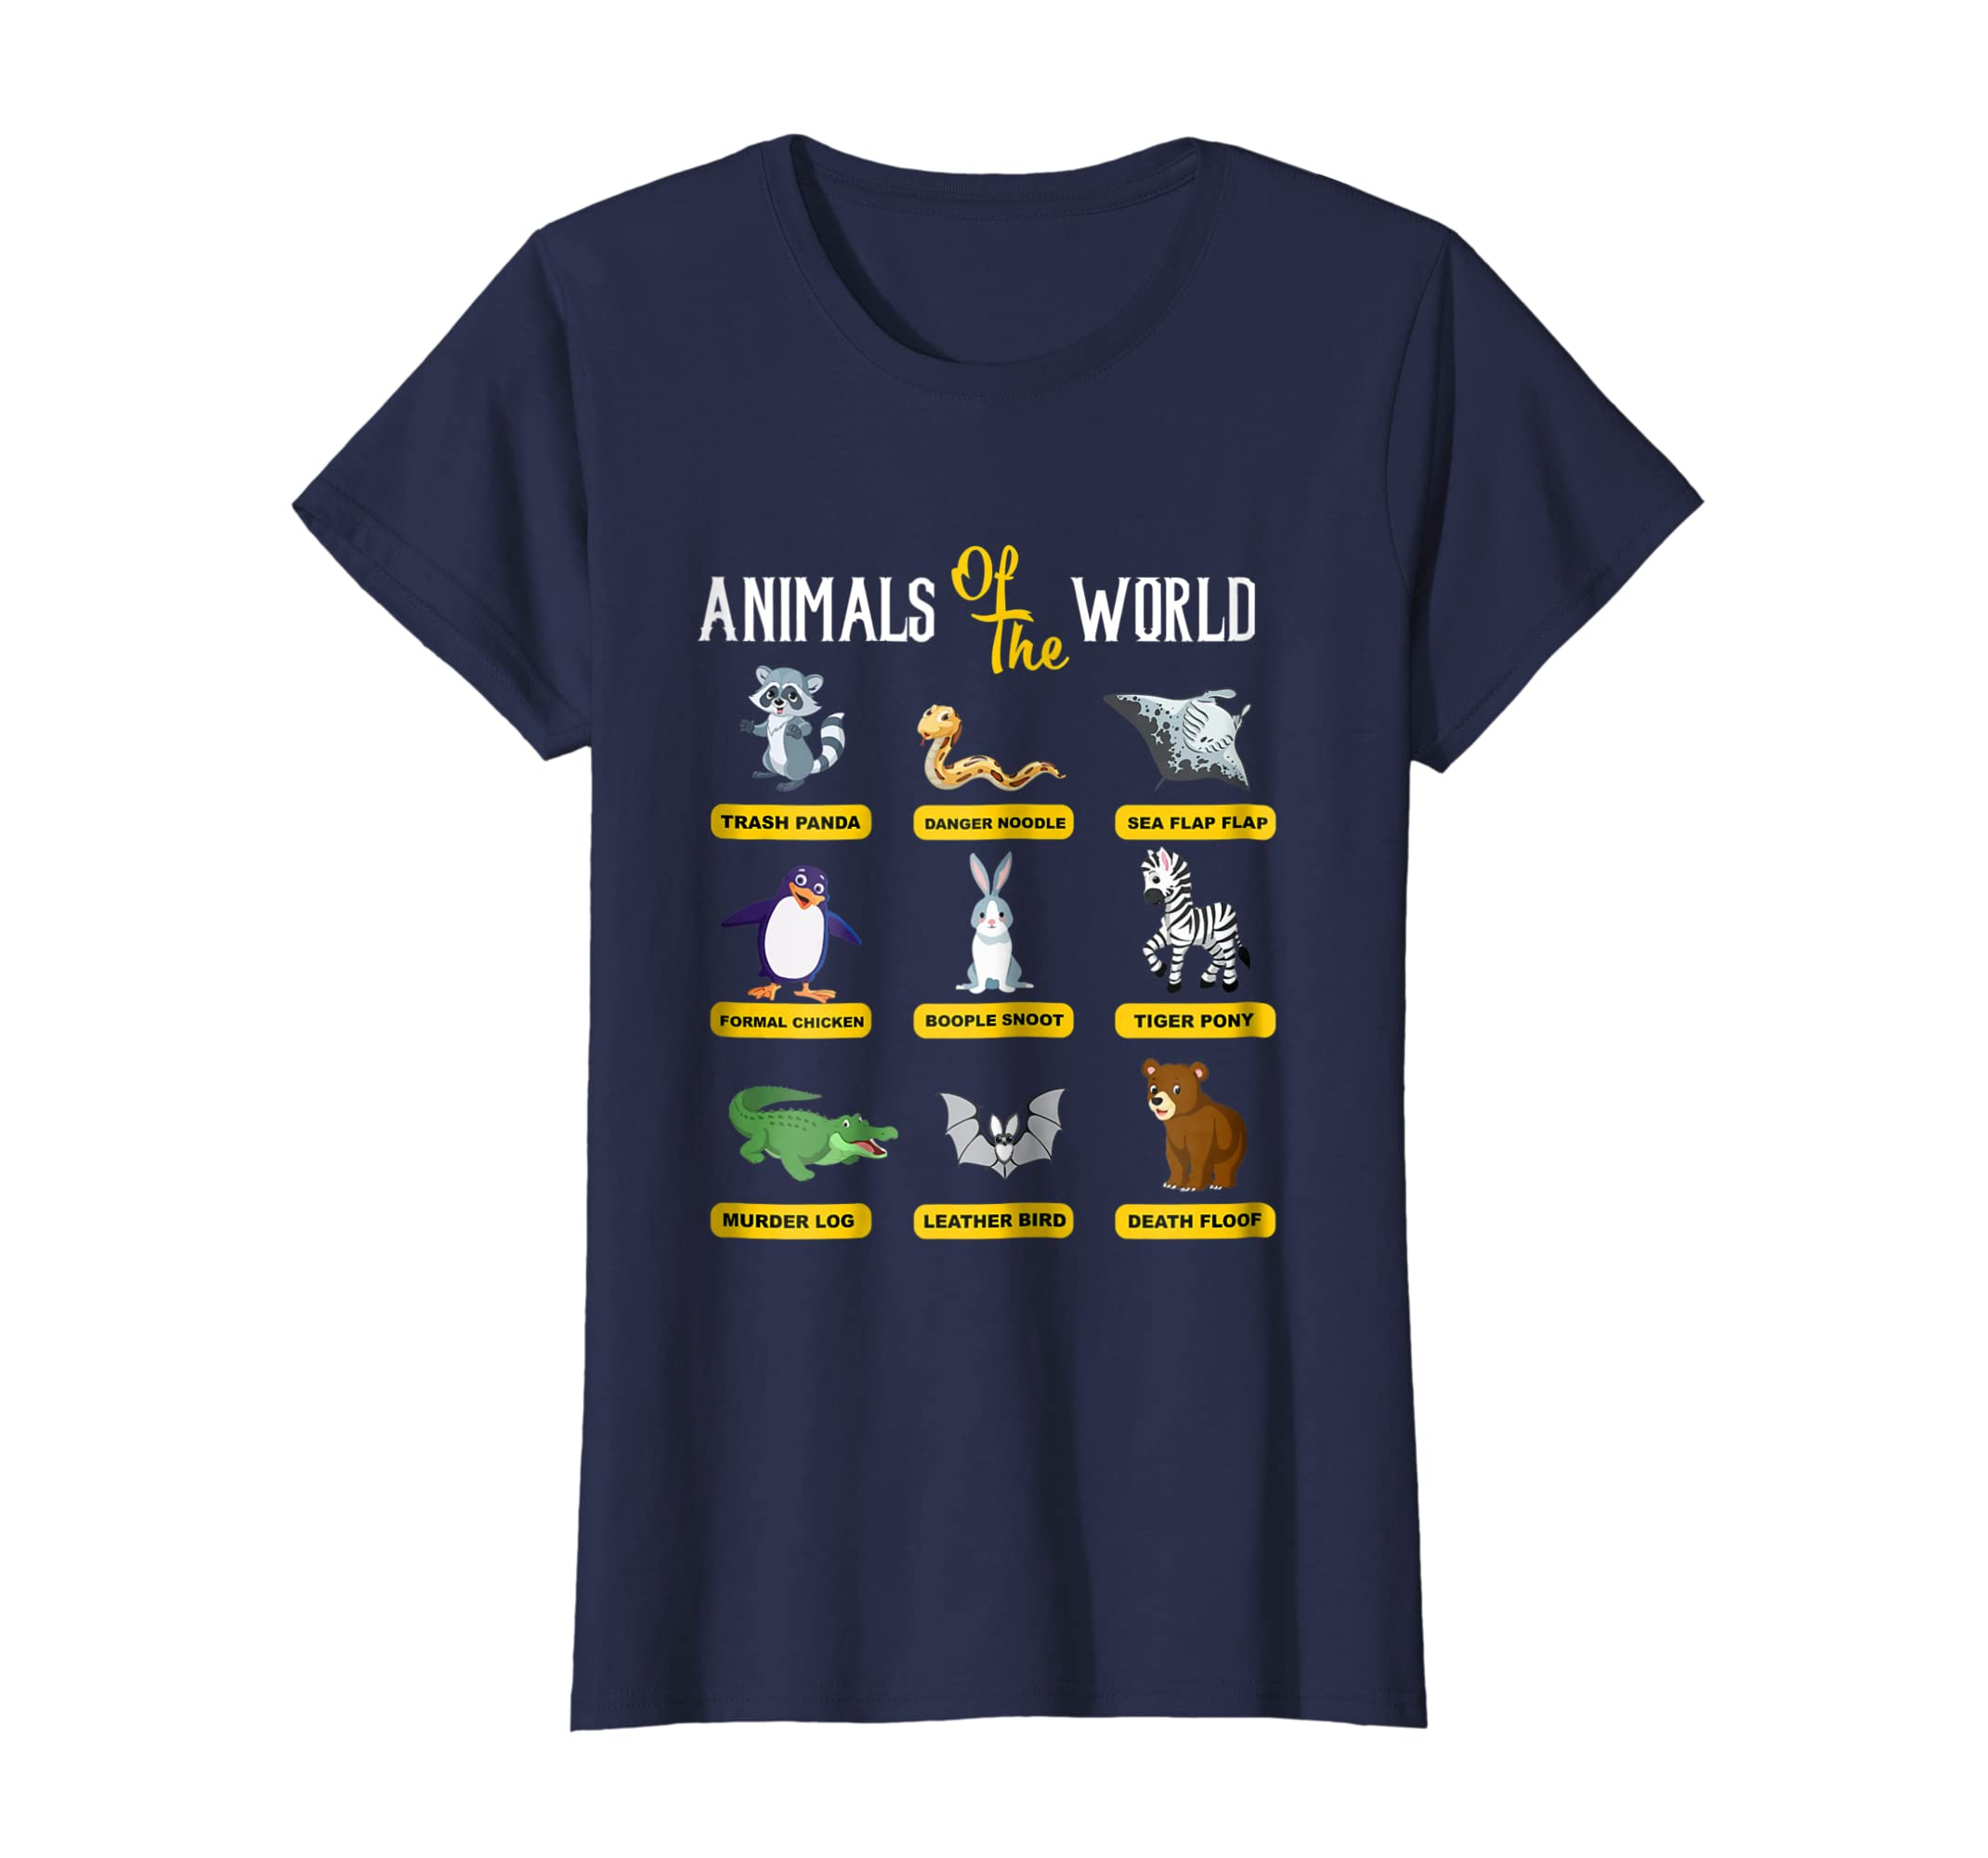 19ab96e7 Amazon.com: Animals Of The World T-Shirt Funny Animal Real Names shirt:  Clothing